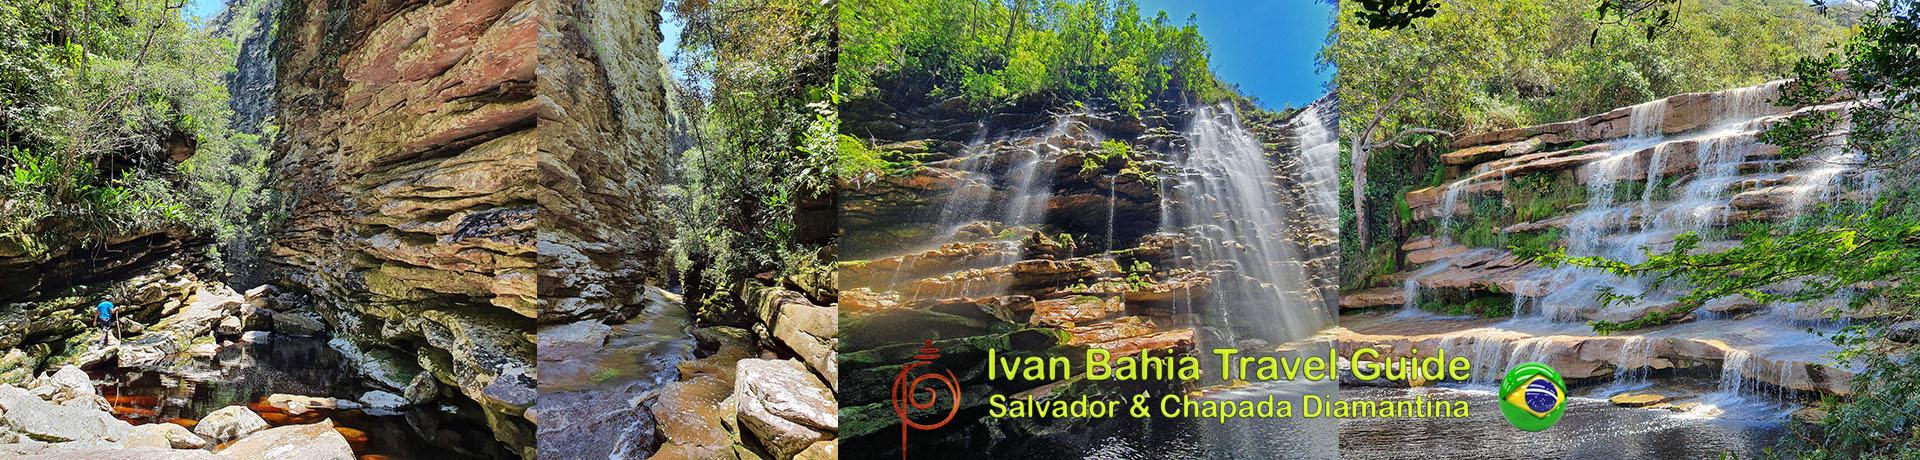 Ivan Bahia & Chapada Diamantina guide / Parc National Chapada Diamantina (connu comme le 'Grand Canyon Brésilien') / #ibtg #ibg #ivanbahiaguide #ivanbahiatravelguide #zenturturismo #ivanchapadadiamantinaguide #valedopati #patyvalley #pati #viapati #valecapao #ivanchapadaguide #chapadadiamantinatransfer #chapadatrekking #chapadaroots #chapadasoul #lencoisbahia #chapadadiamantinatrekking #ivanchapadadiamantinaguide  #chapadadiamantinaguide  #guidechapadadiamantina #lencois #lençois #chapadaadventuredaniel #diamondmountains #zentur # #guiachapadadiamantina #chapadaaventure #discoverchapada #gay #voyagesgay #lgbt #gayhoneymoon #gaybrazil #chapadasoul #diamantinatrip  #tripadvisor #bahiametisse, #fernandobingre, #ivansalvadorbahia #salvadorbahiaTravel #toursbylocals #fotosbahia #bahiafotos #chapadadiamantinanationalpark #yourtoursbrazil #maurotours #bahiatopturismo #bahiapremium #maisbahiaturismo  #cassiturismo